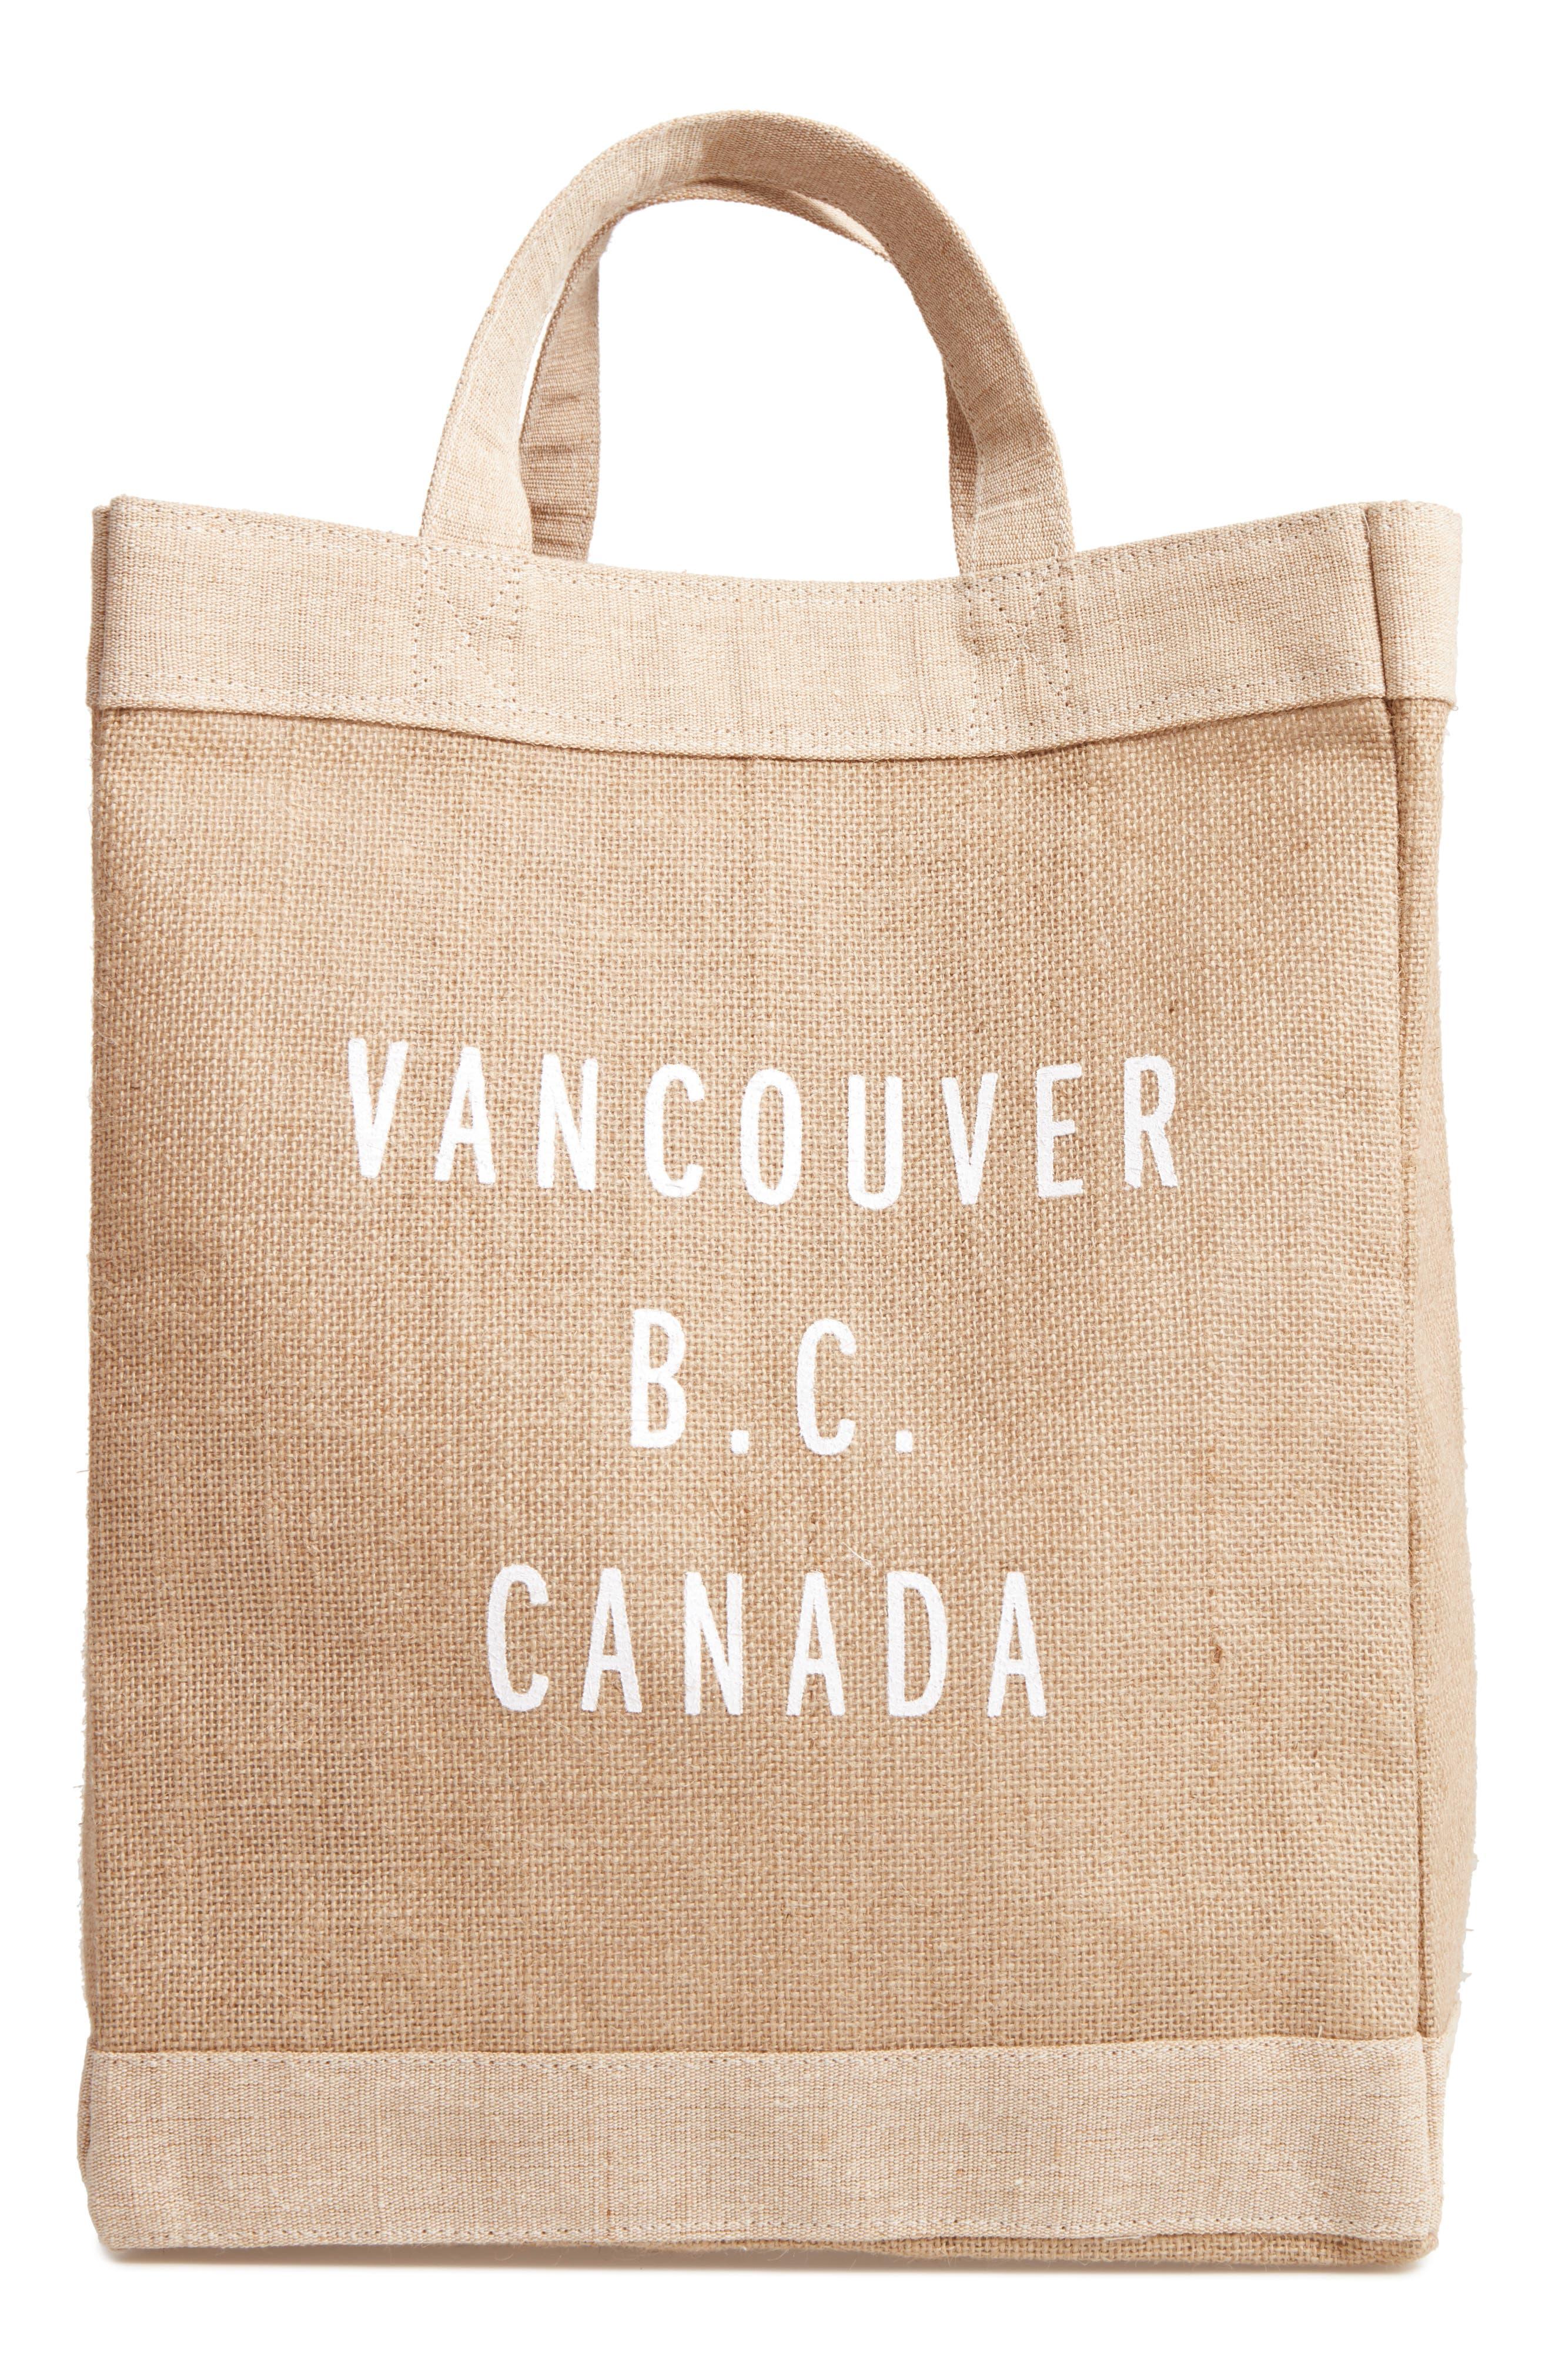 Vancouver Simple Market Bag,                             Main thumbnail 1, color,                             Natural